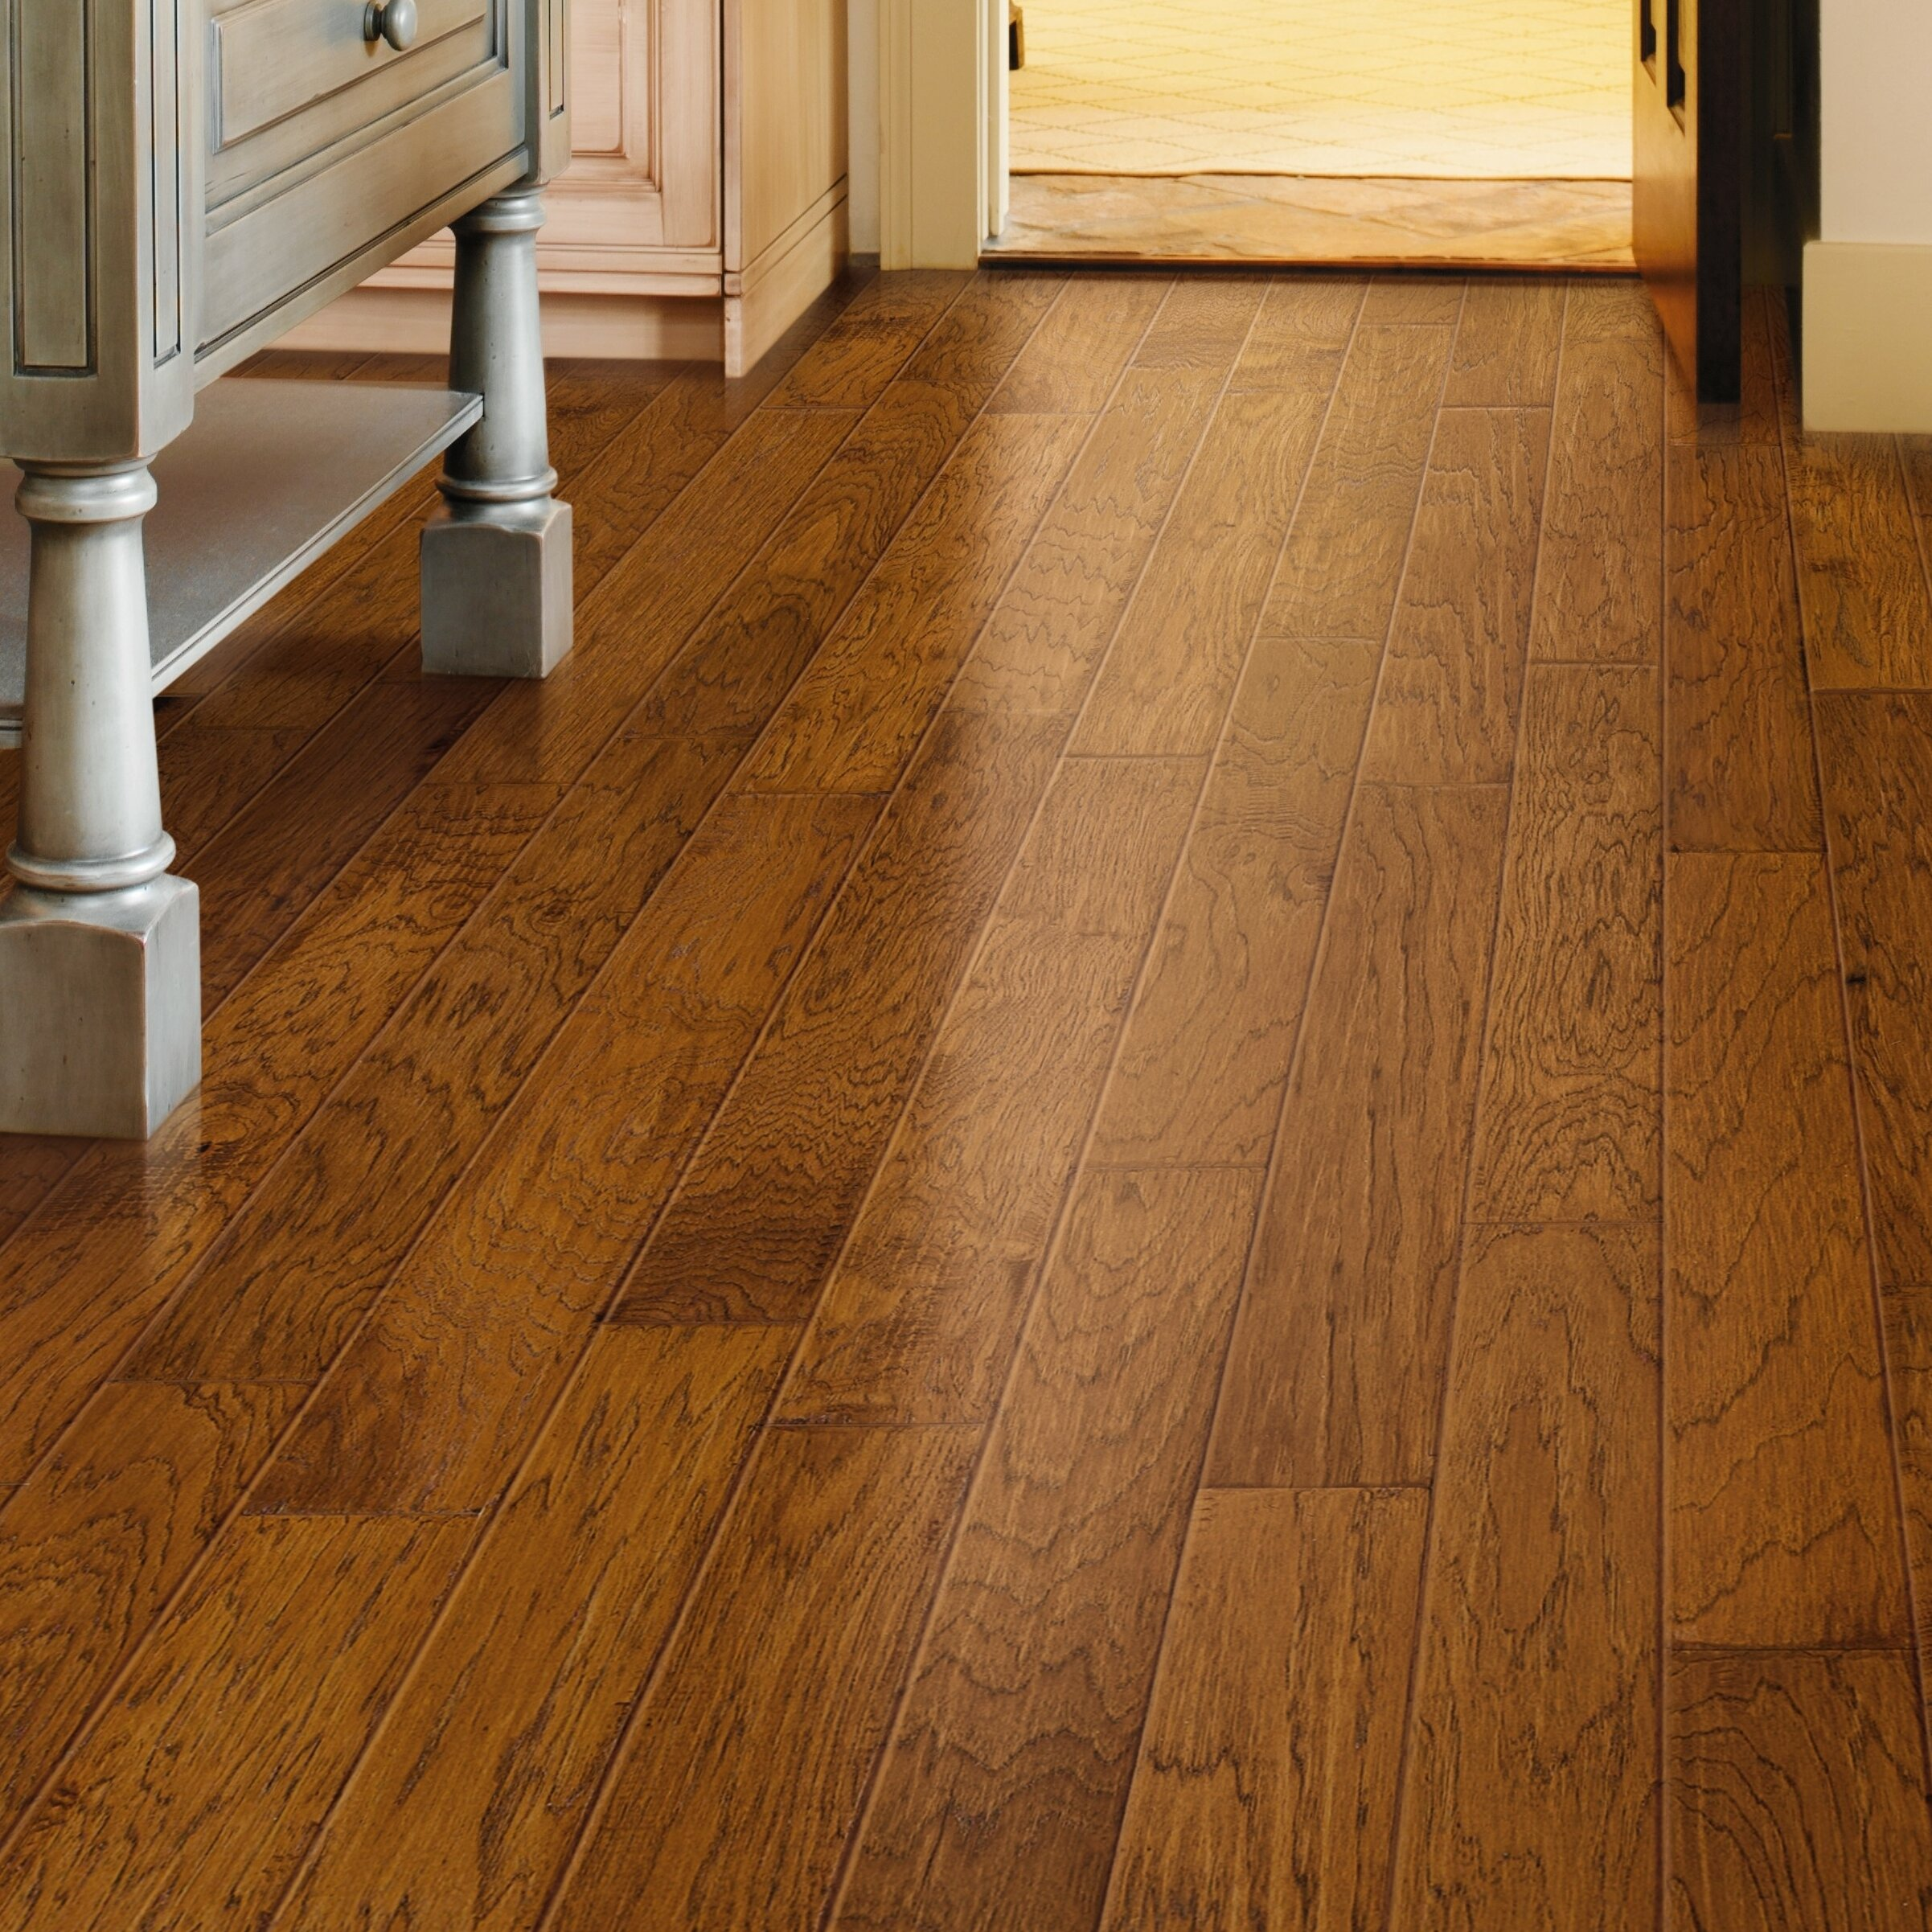 floor hickory kinsey floors flooring grade hardwood character